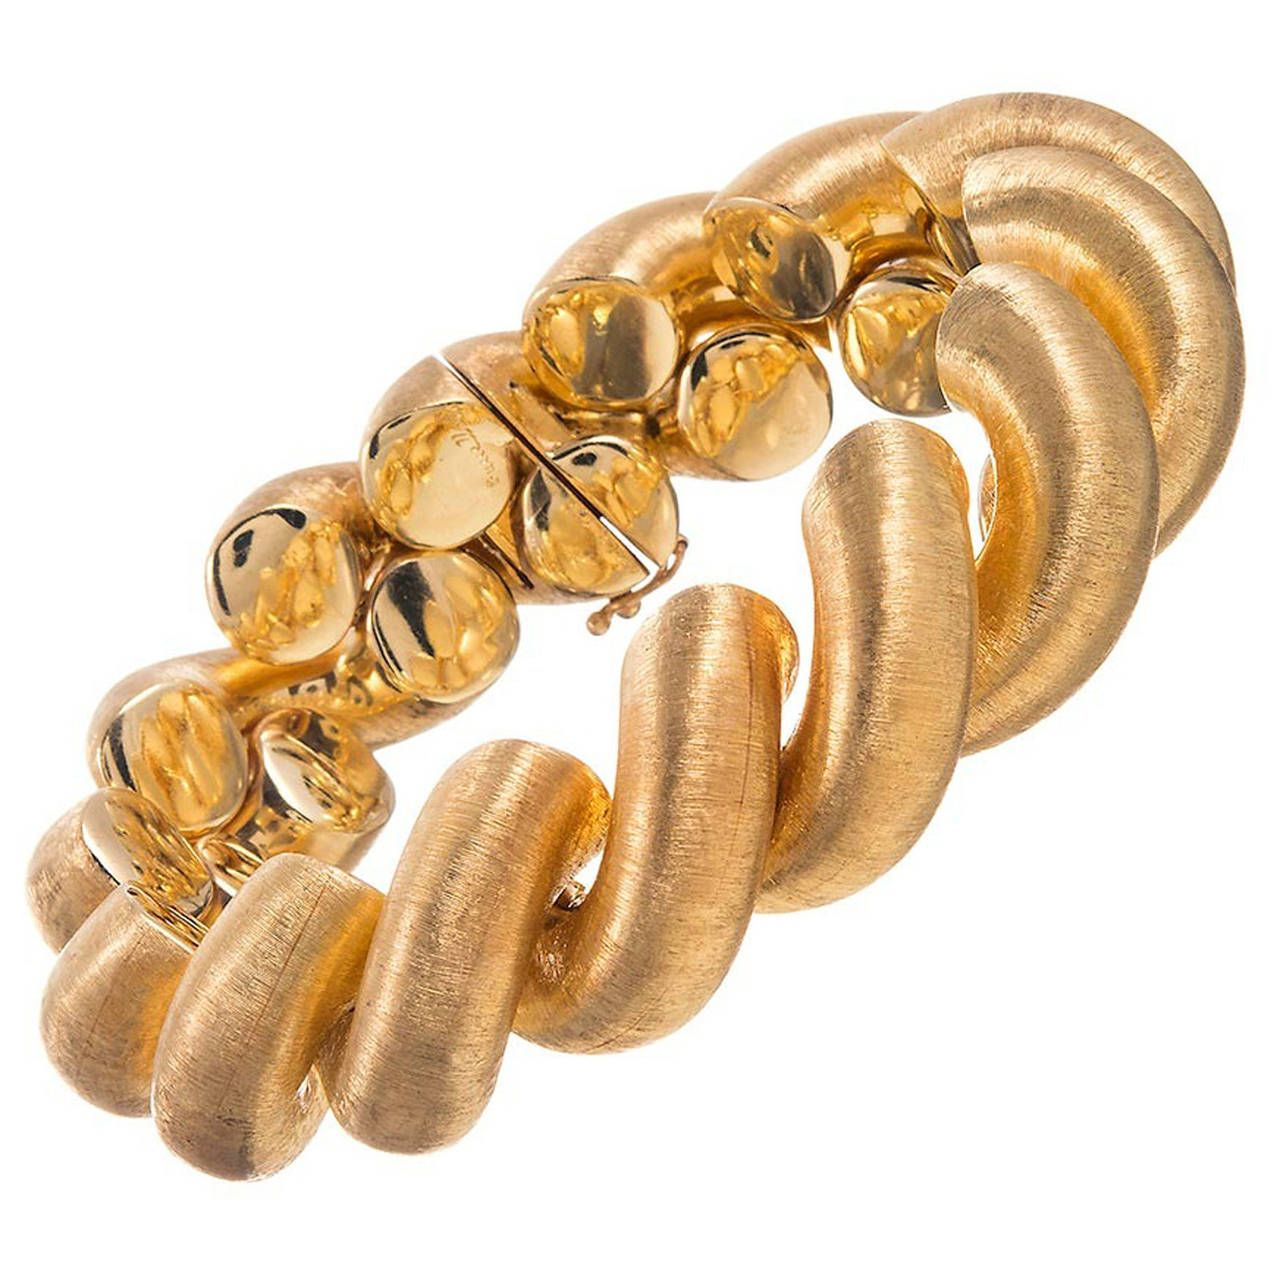 Buccellati twisted gold rope bracelet